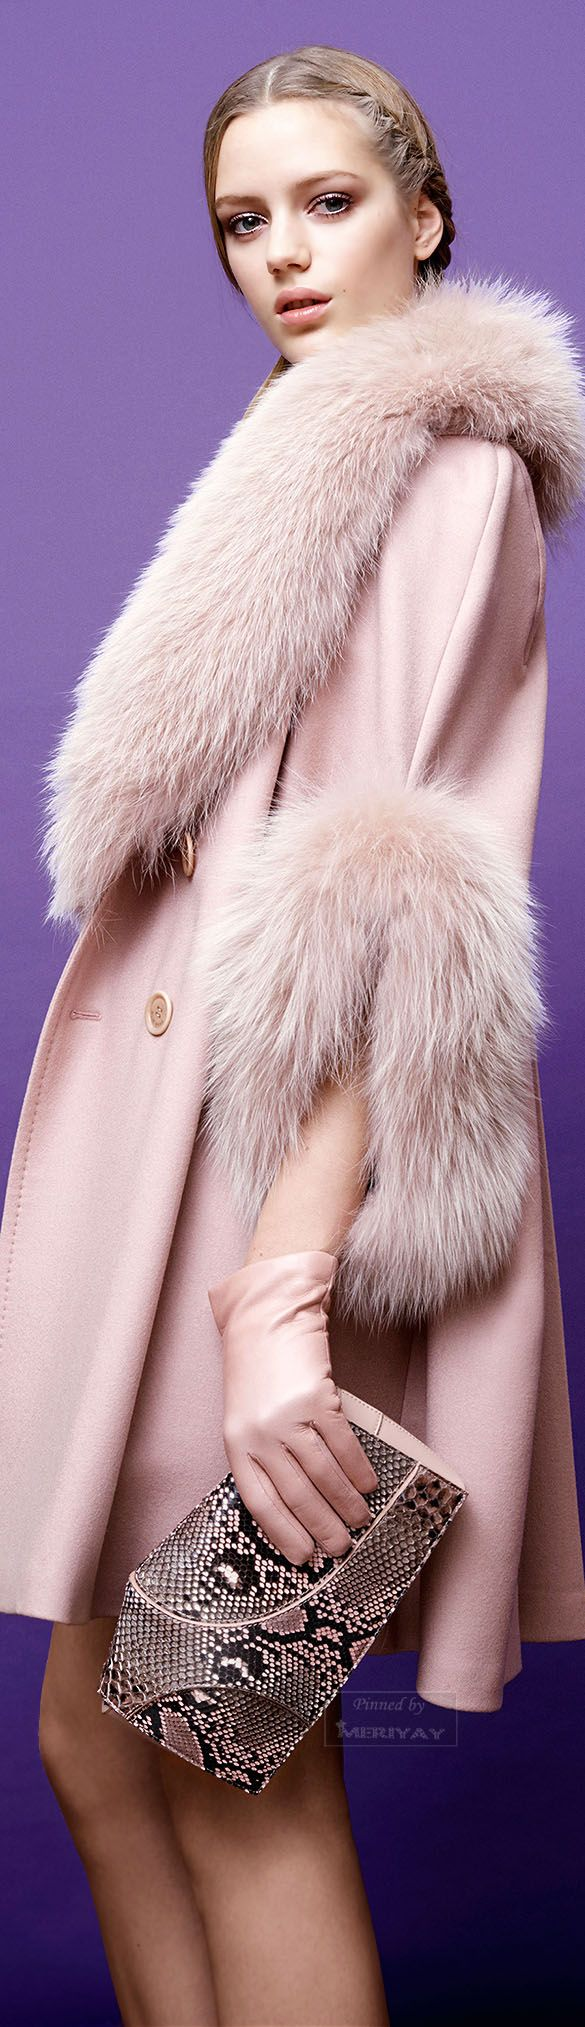 Elie Saab.~ Fur trimmed Cashmere Top Coat Pale Pink, Pre-Fall 2015.